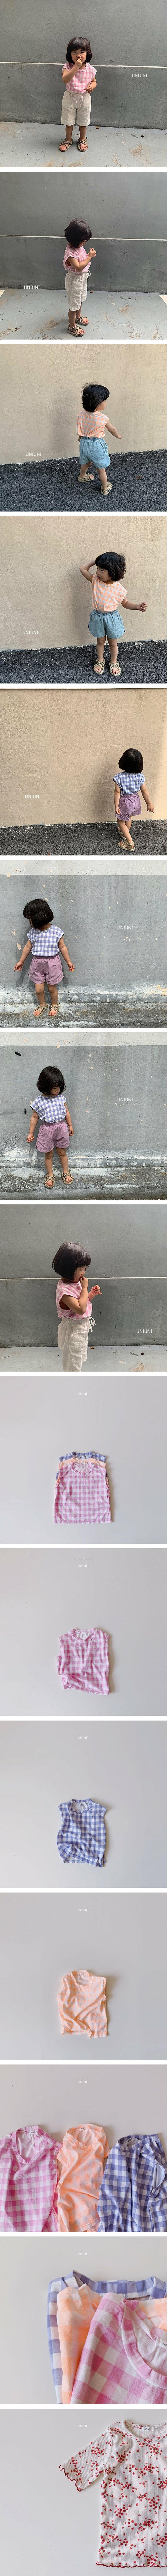 UNIUNI - Korean Children Fashion - #Kfashion4kids - Square Sleeveless Top